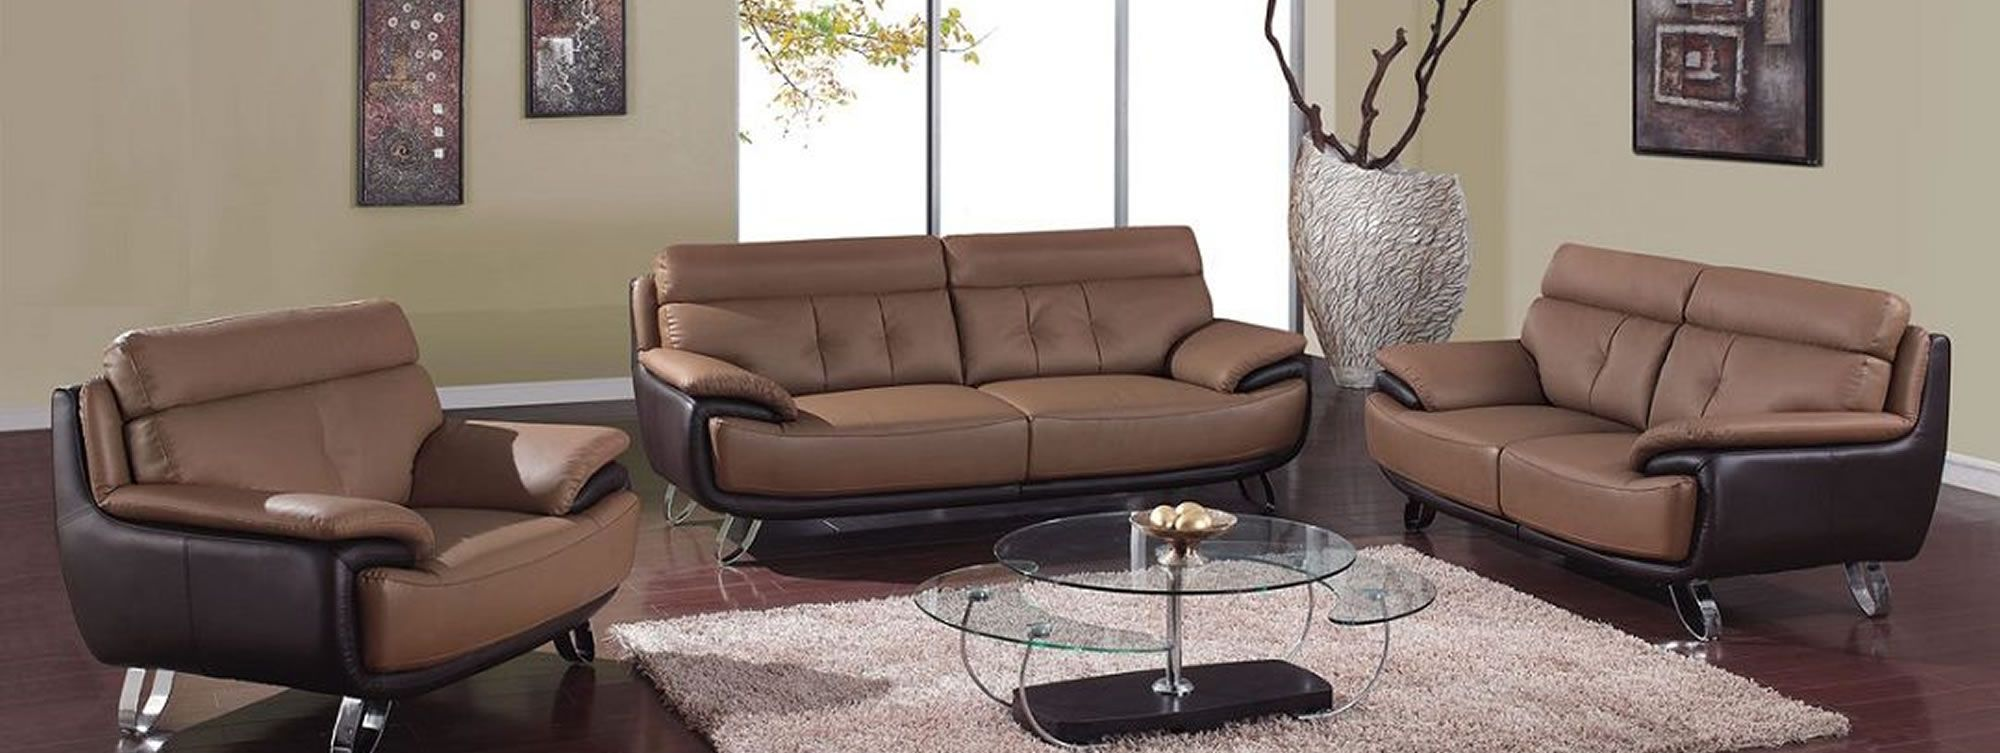 Onlinedealz Leather Living Room Furniture Living Room Sets Furniture Living Room Leather [ 753 x 2000 Pixel ]